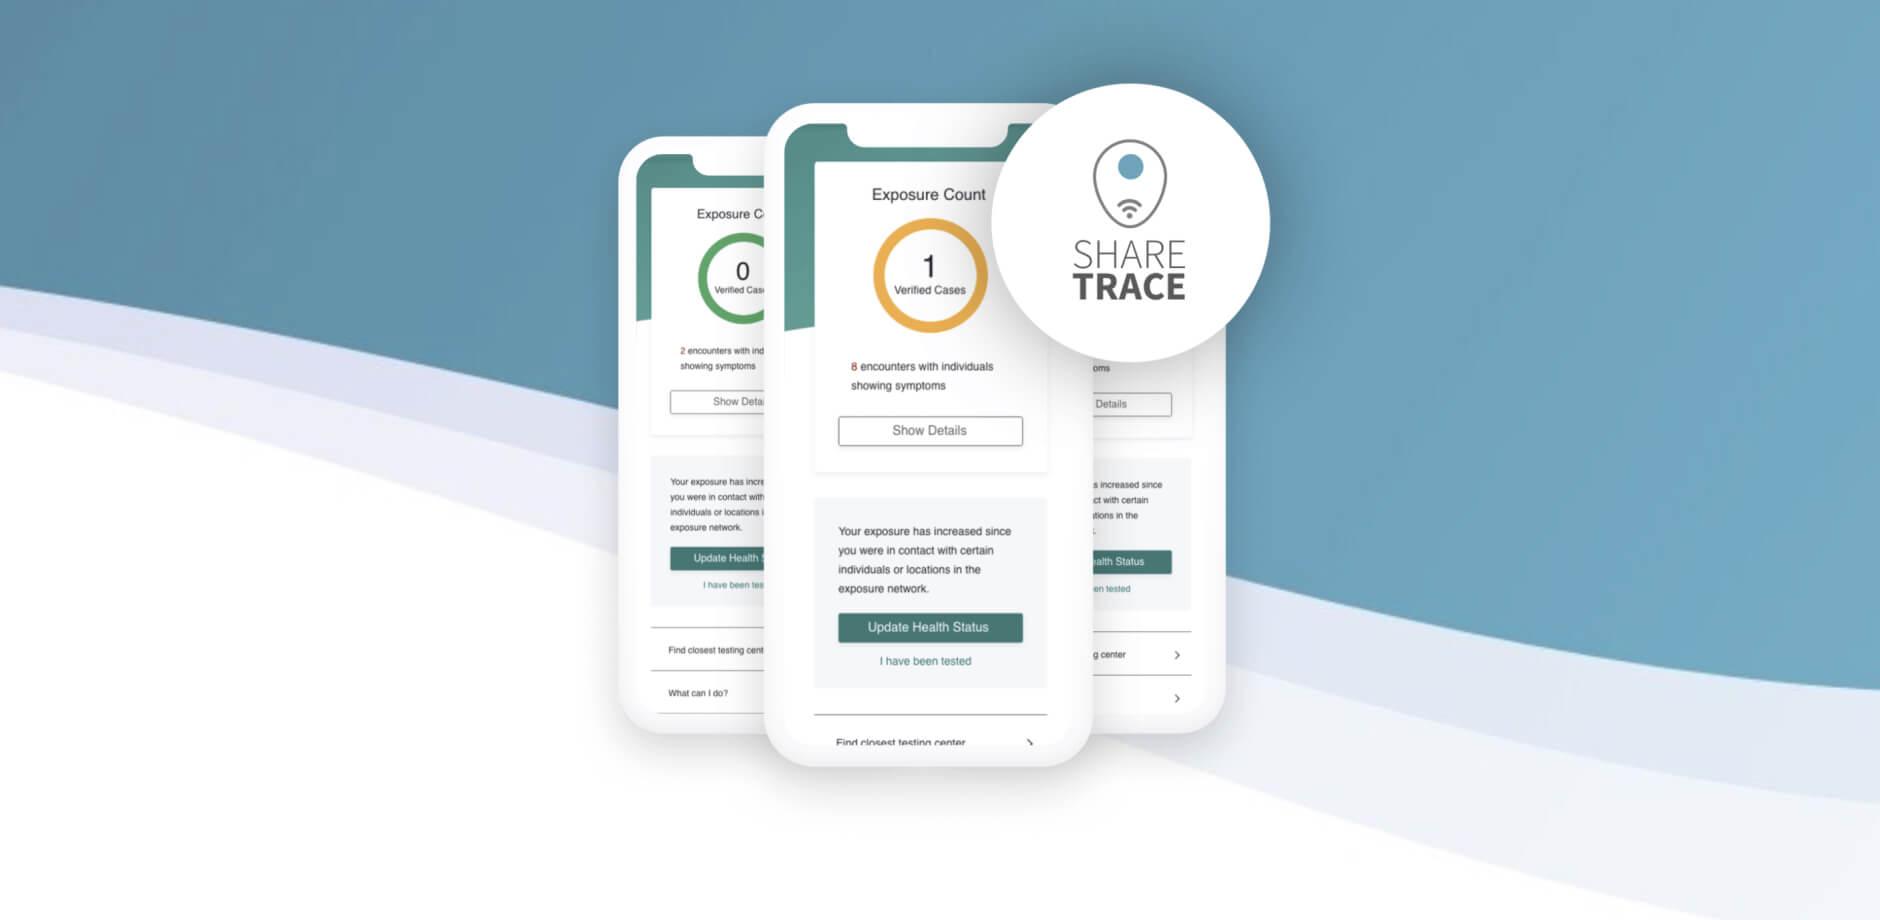 Case Study: ShareTrace - A Smart Digital Risk Assessment Service